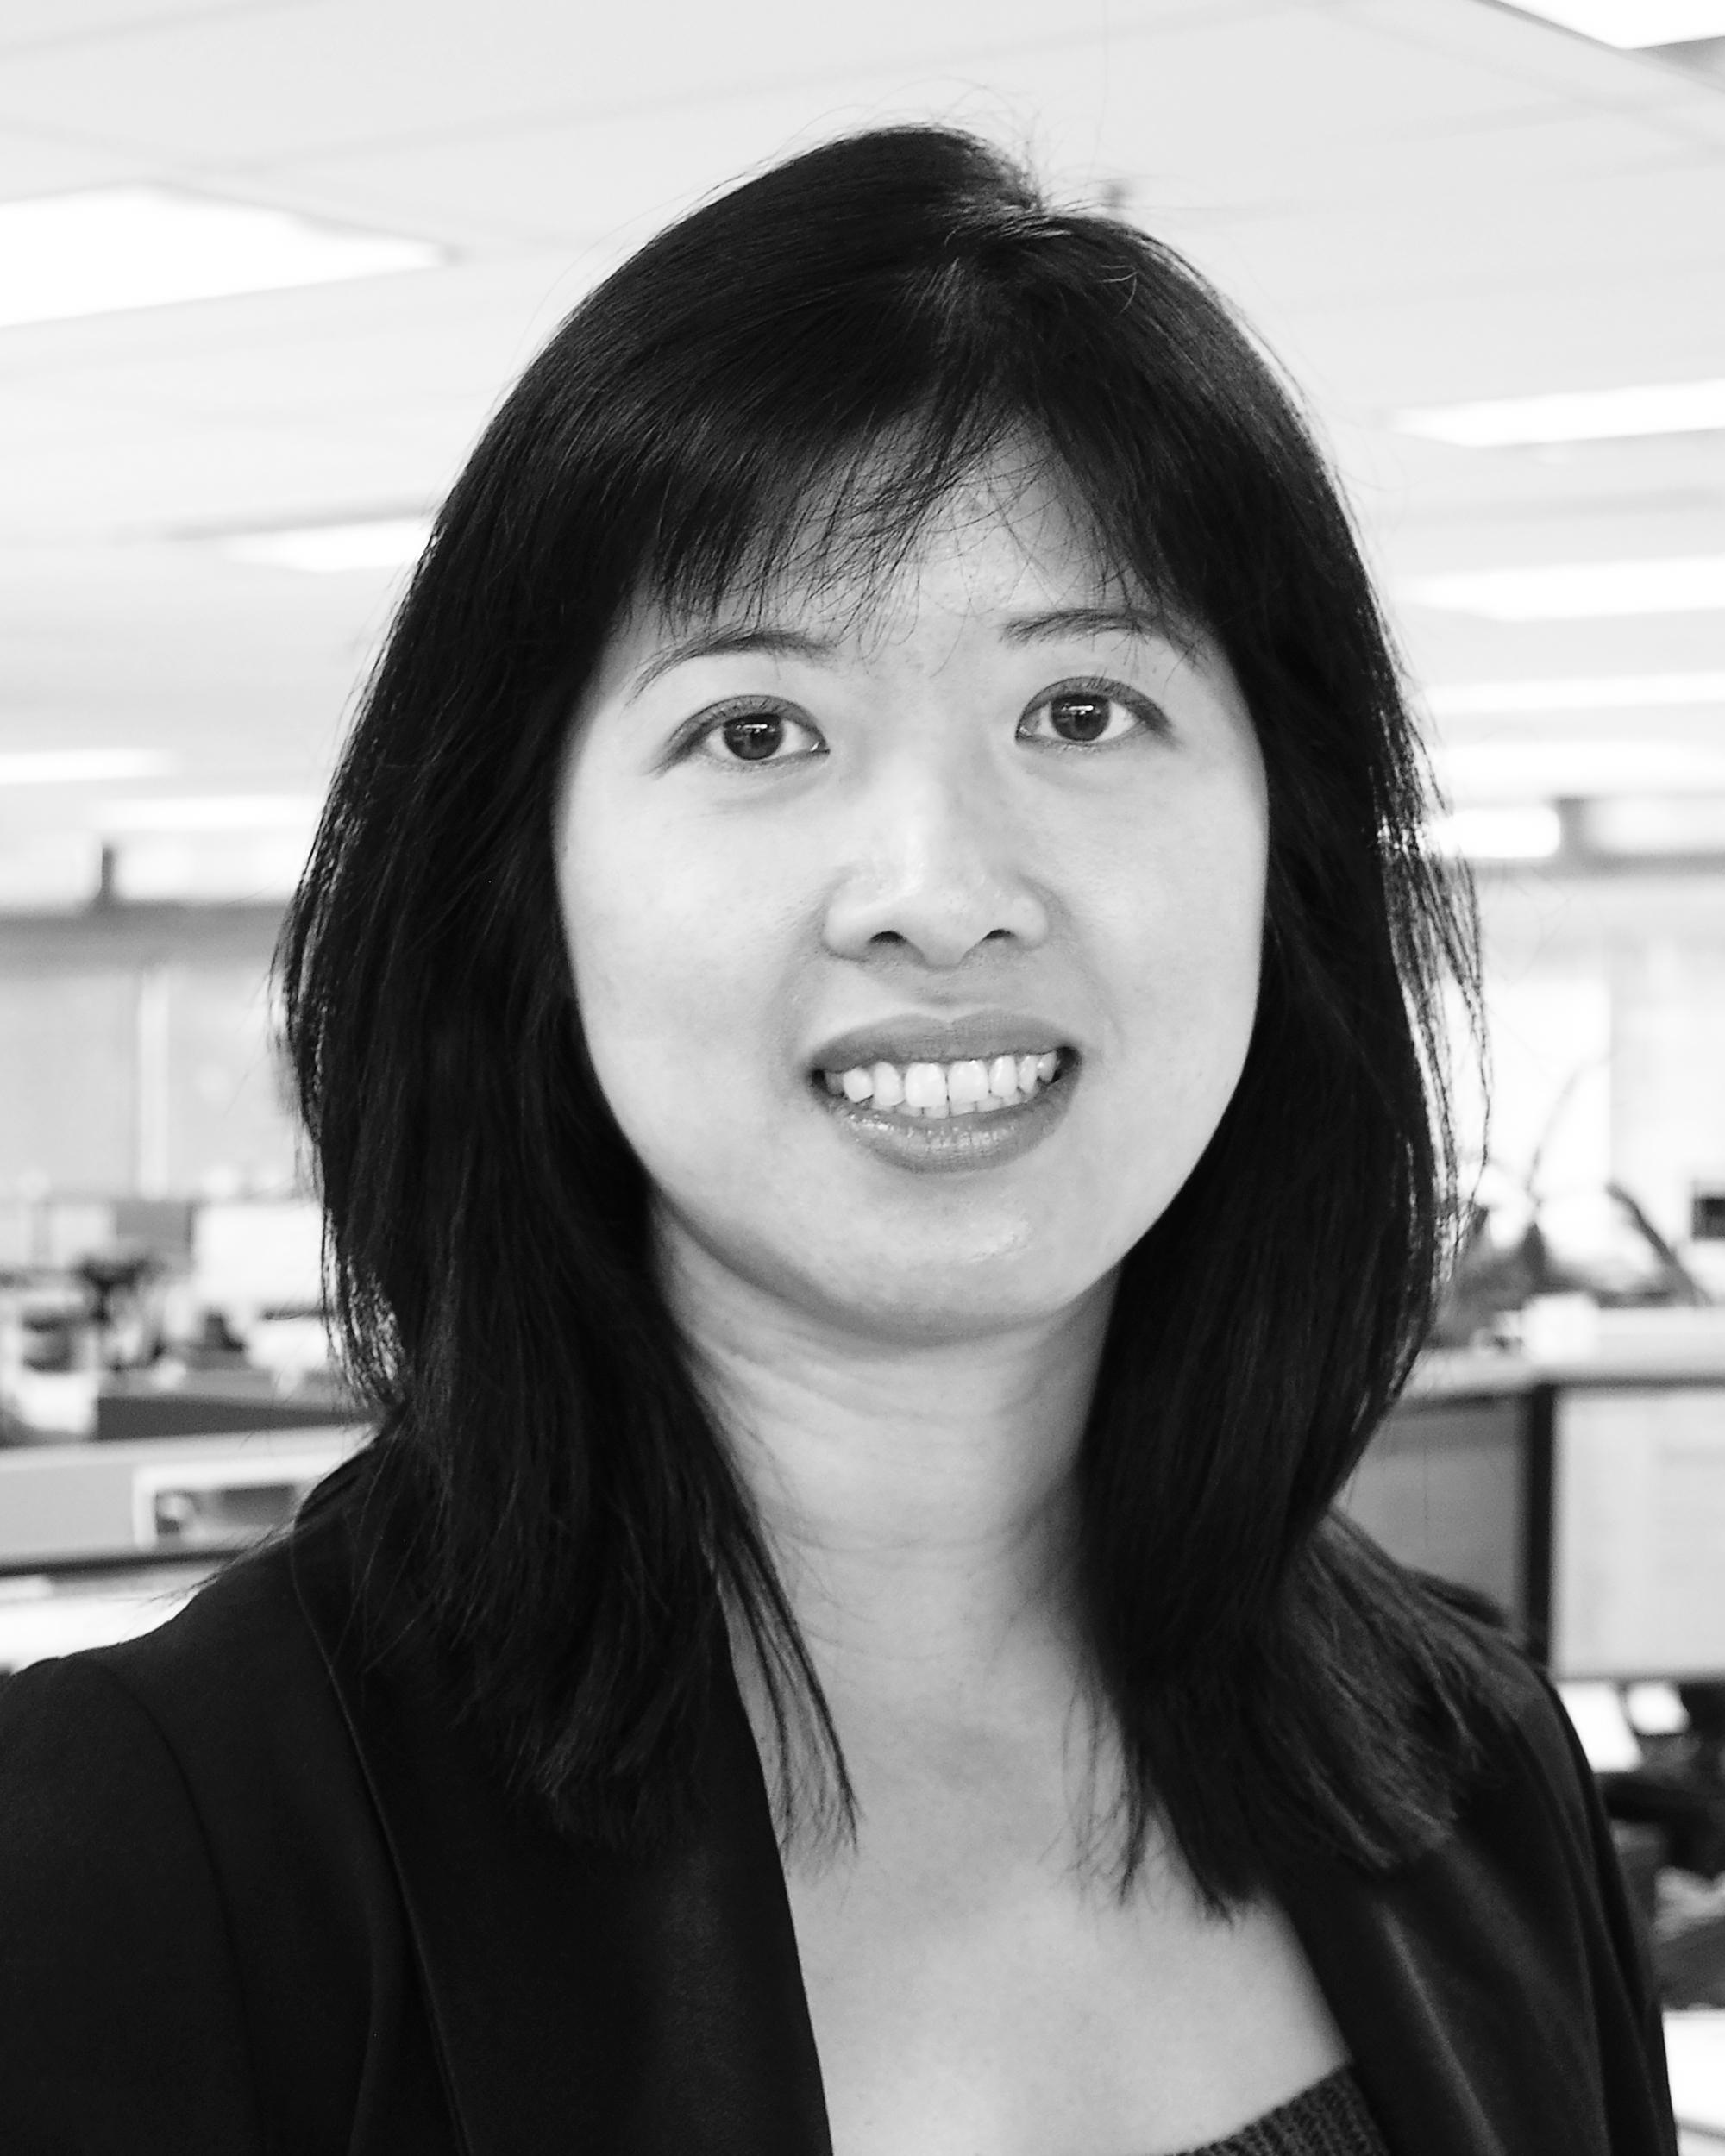 Headshot of Vivian Tong